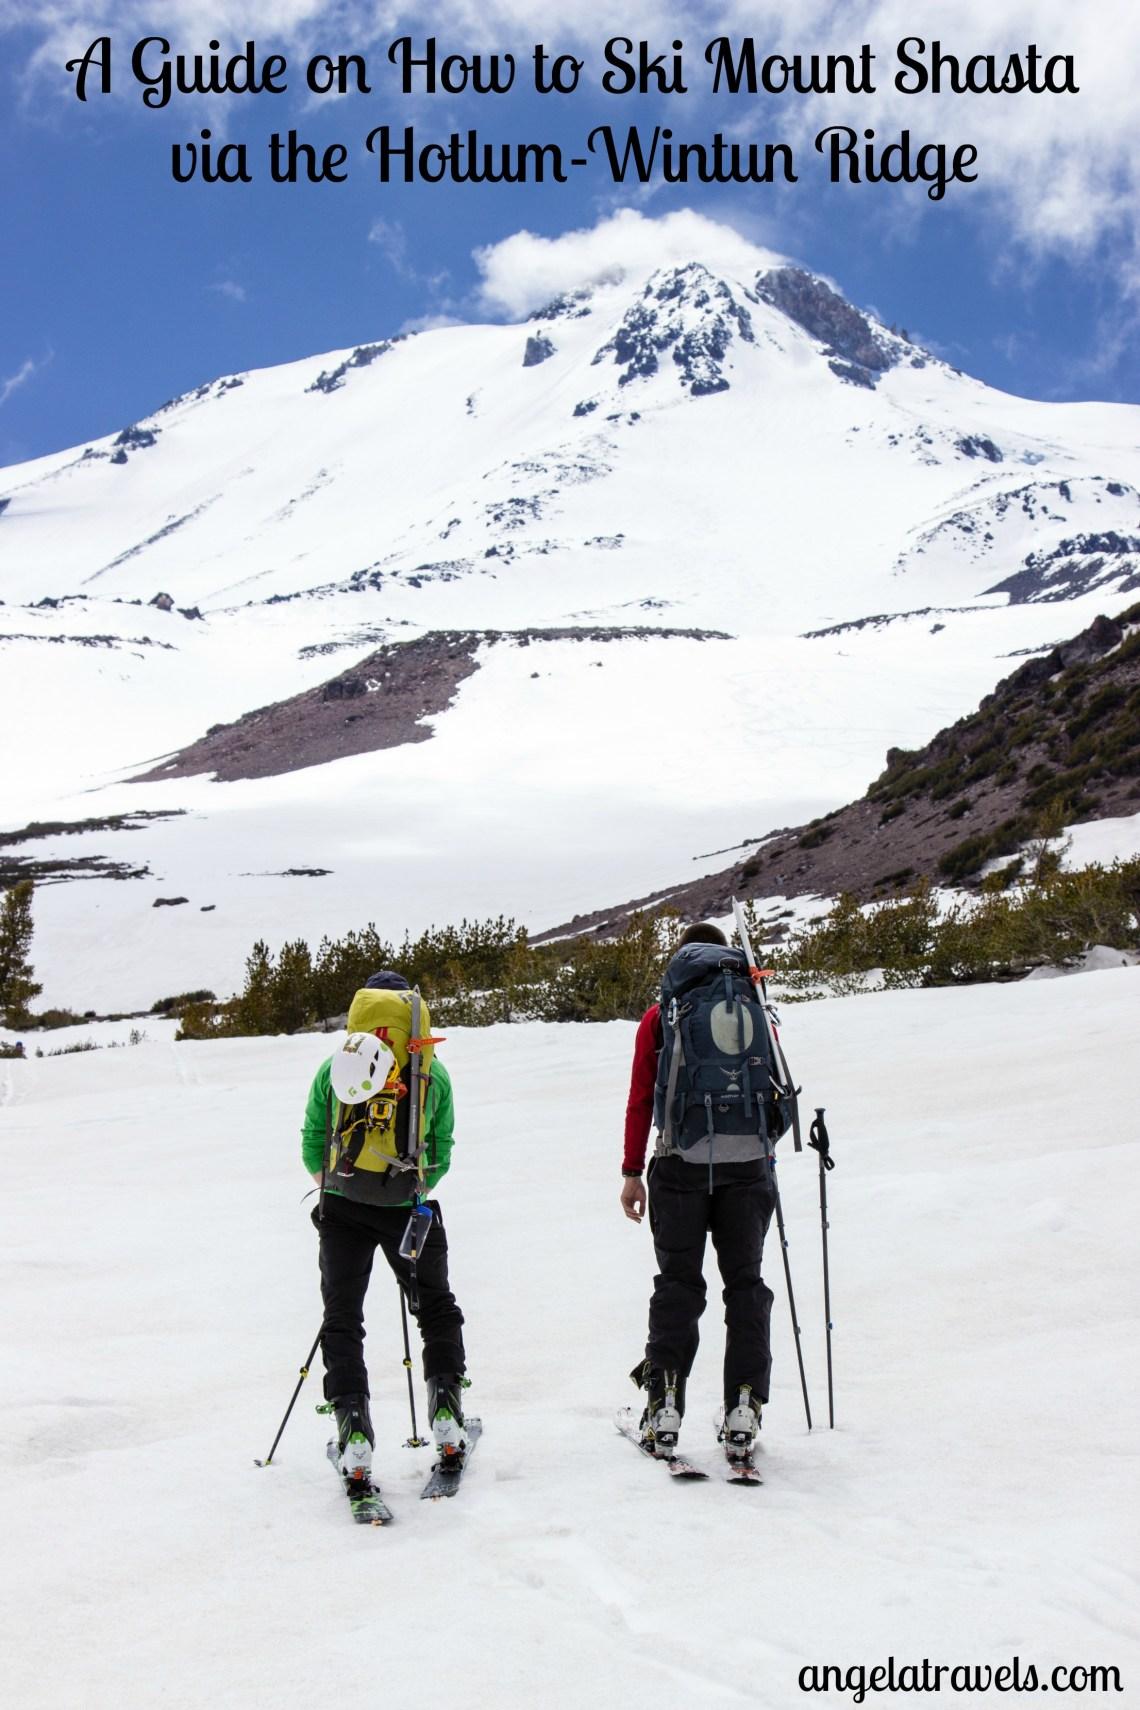 Everything you need to know to climb and ski Mt. Shasta's Hotlum-Wintun Ridge.